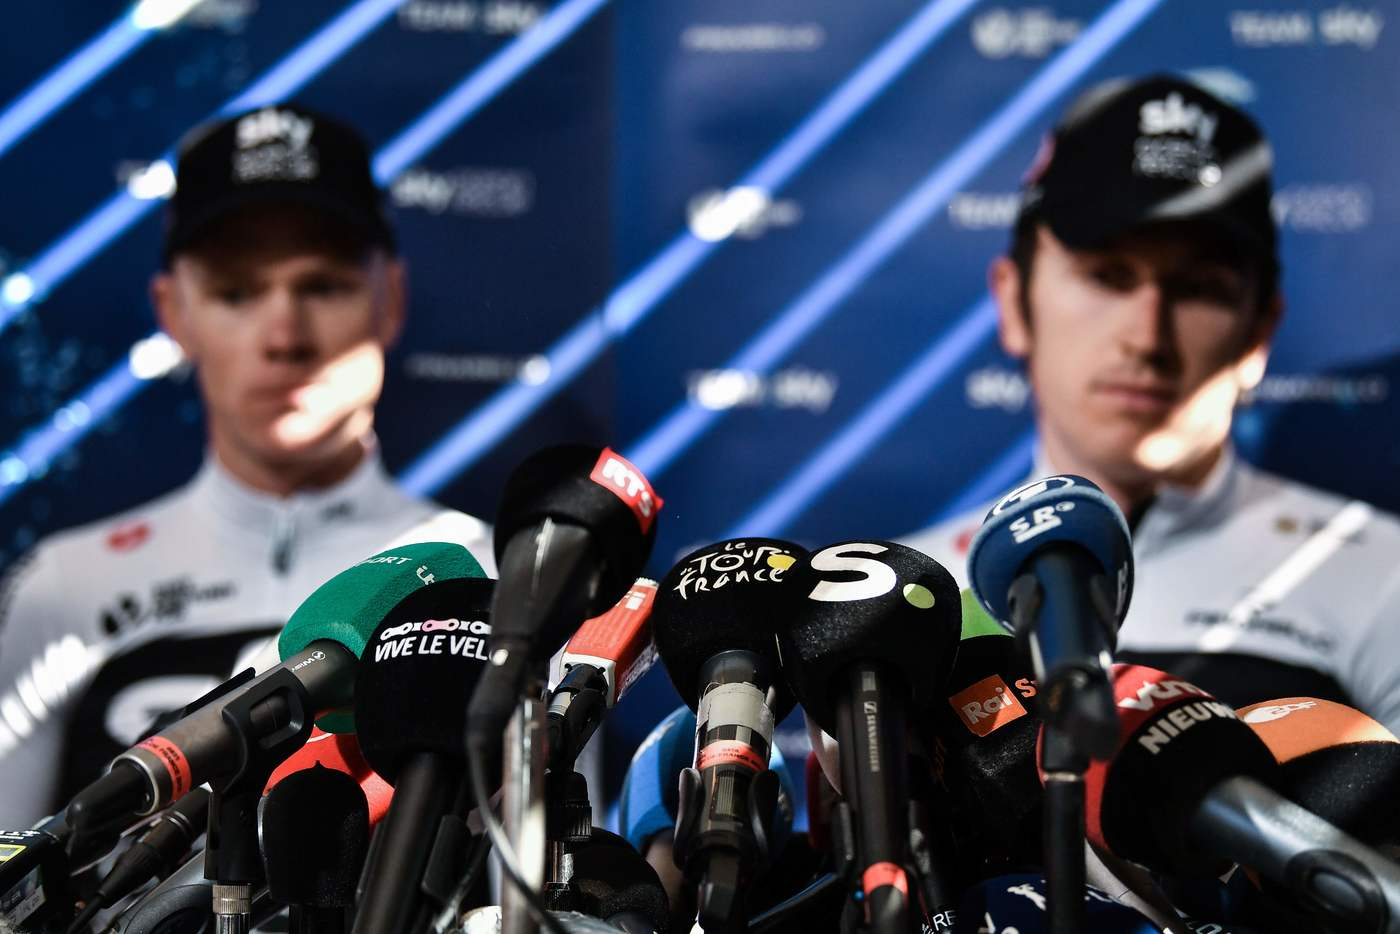 Pronostico Tour de France 2018 favoriti tappa 16: Carcassonne-Bagnères de Luchon, i consigli per provare la cassa insieme al B-Lab!